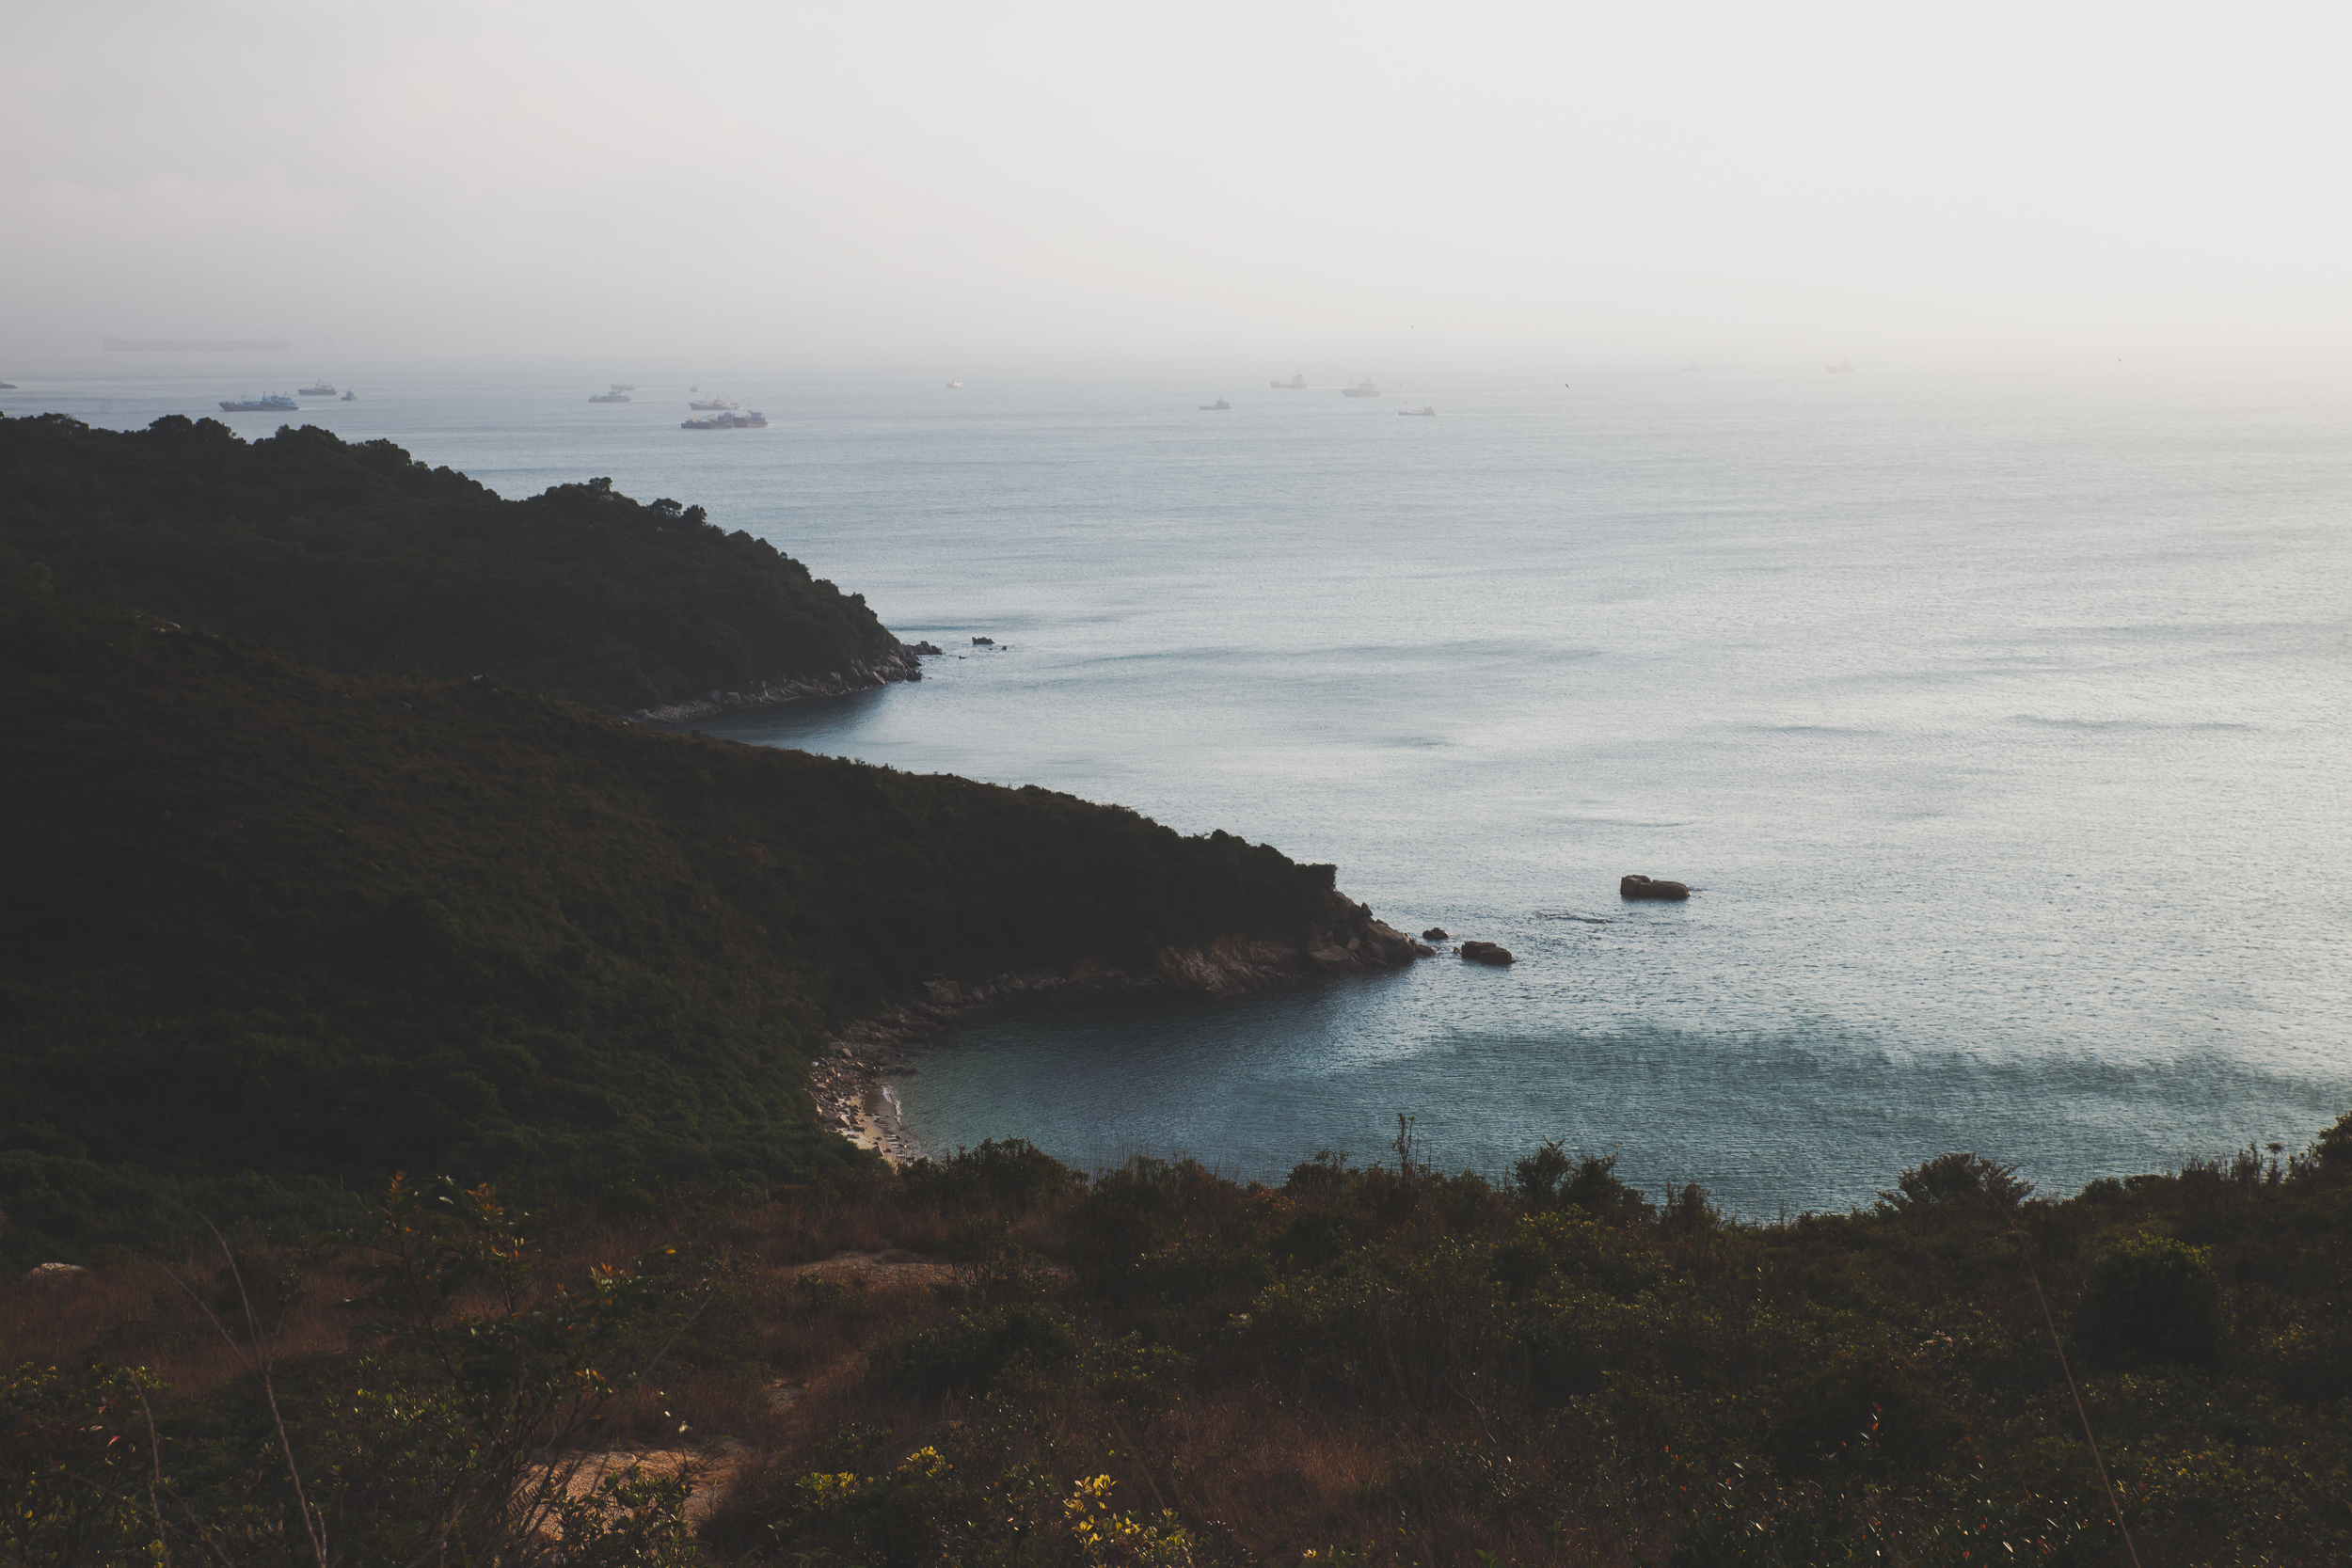 Coast off of Lamma Island